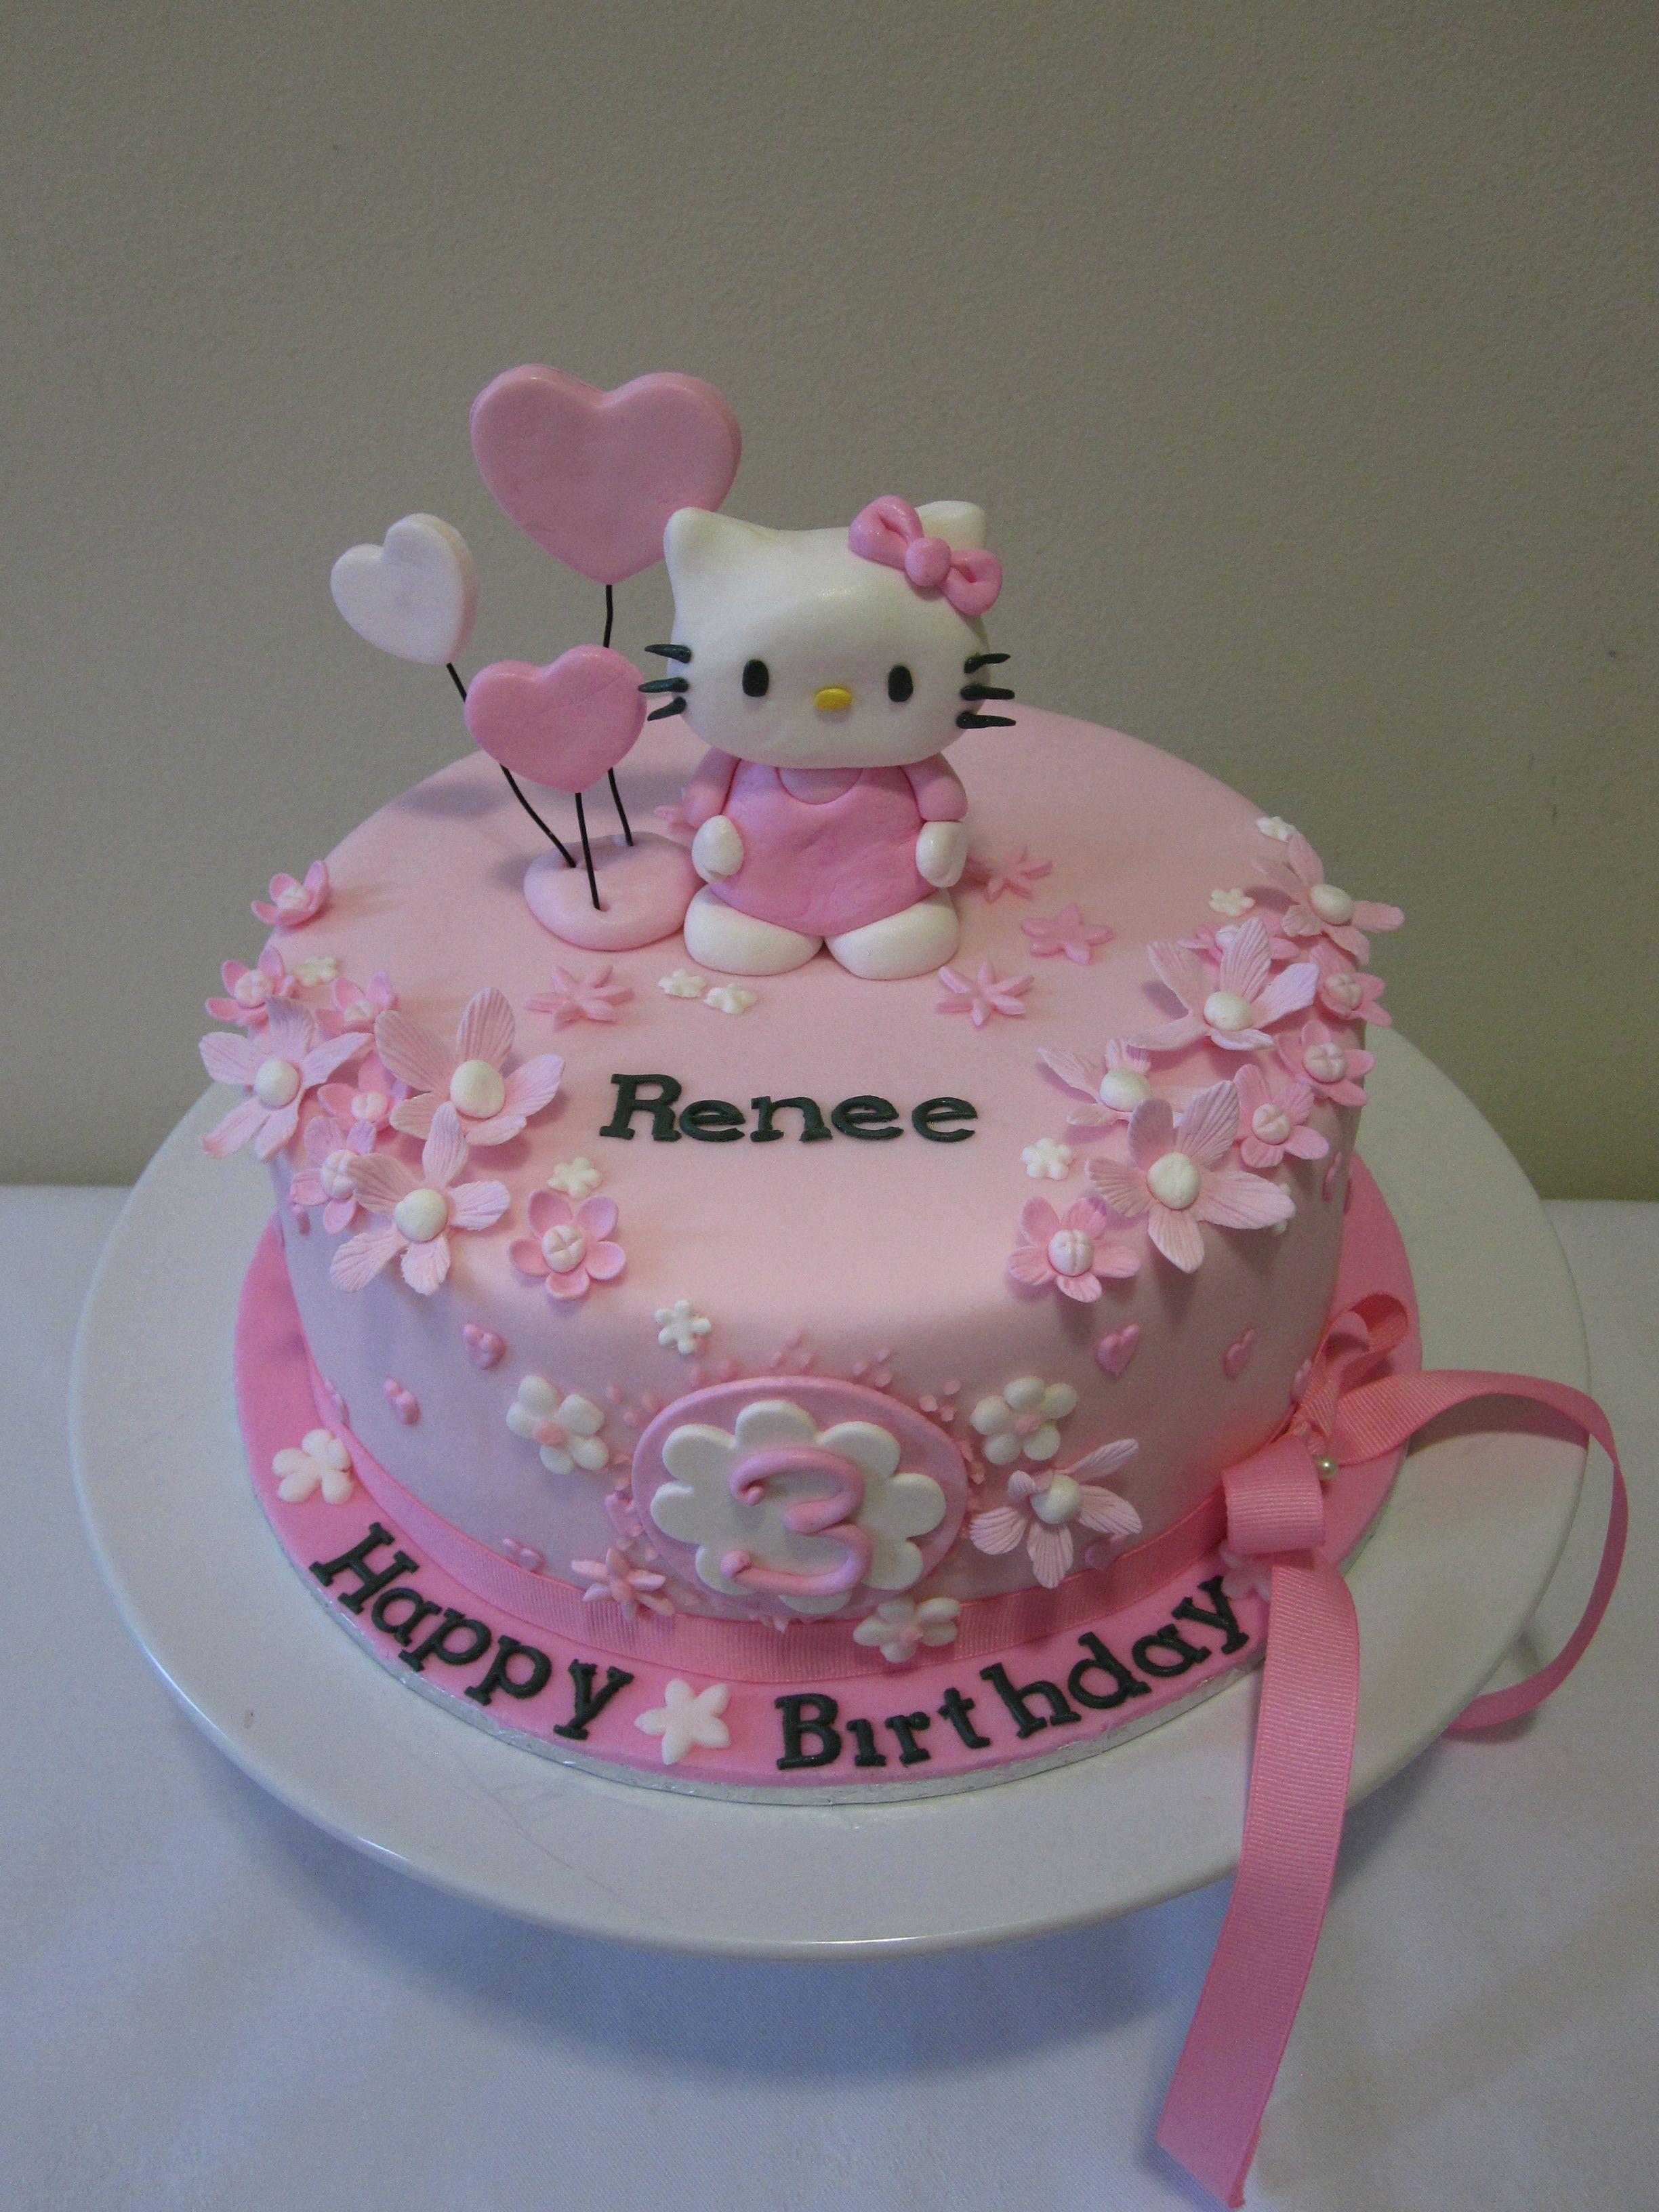 Img 1025 New Jpg 1058 1600 Hello Kitty Birthday Cake Hello Kitty Cake Hello Kitty Birthday